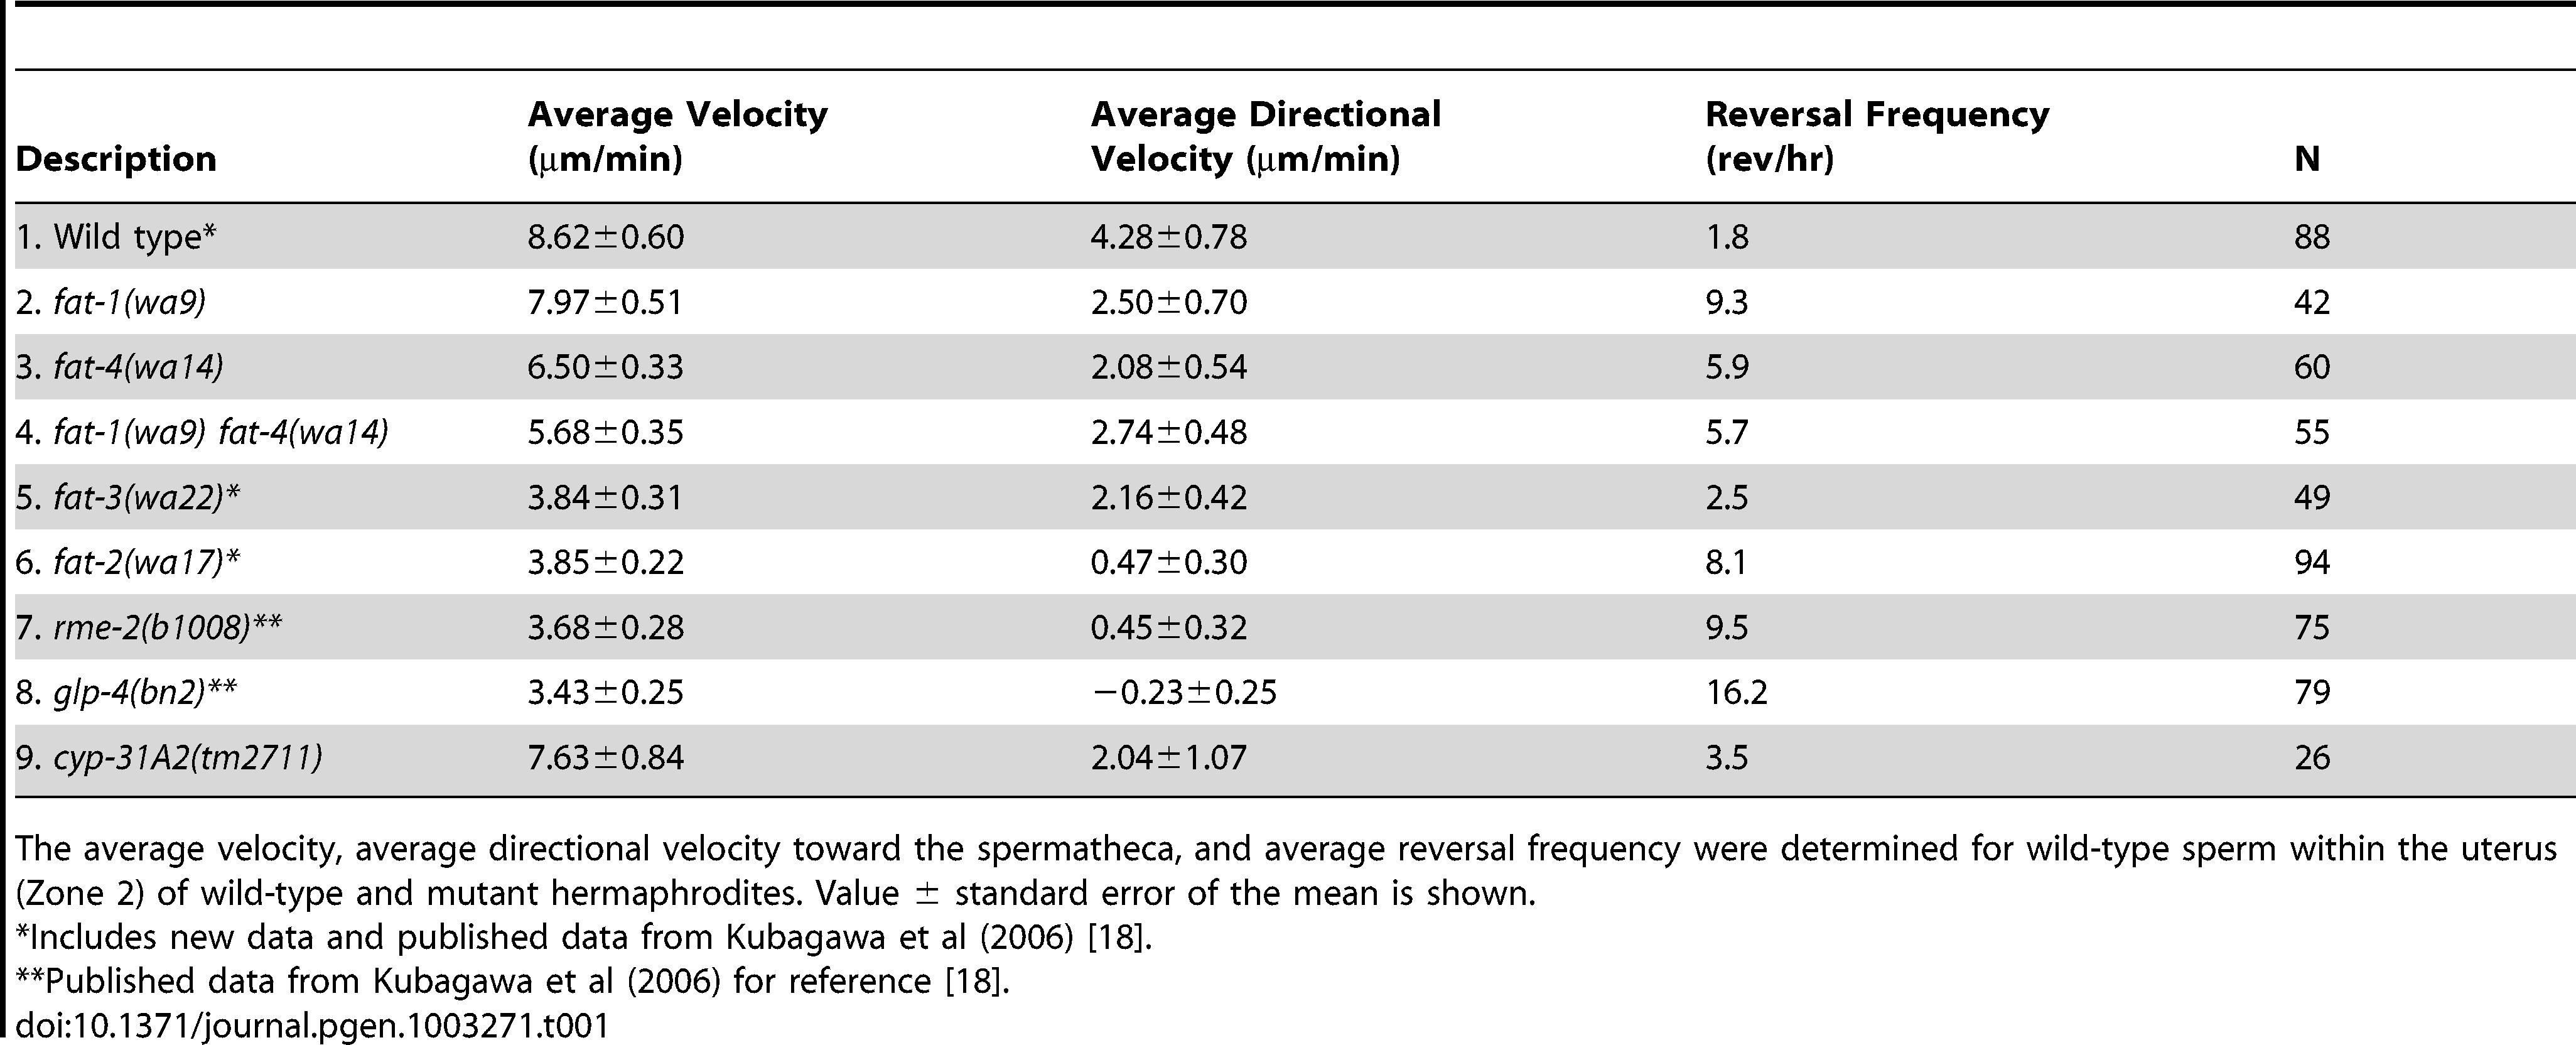 Sperm motility values in wild-type and mutant hermaphrodite uteri.